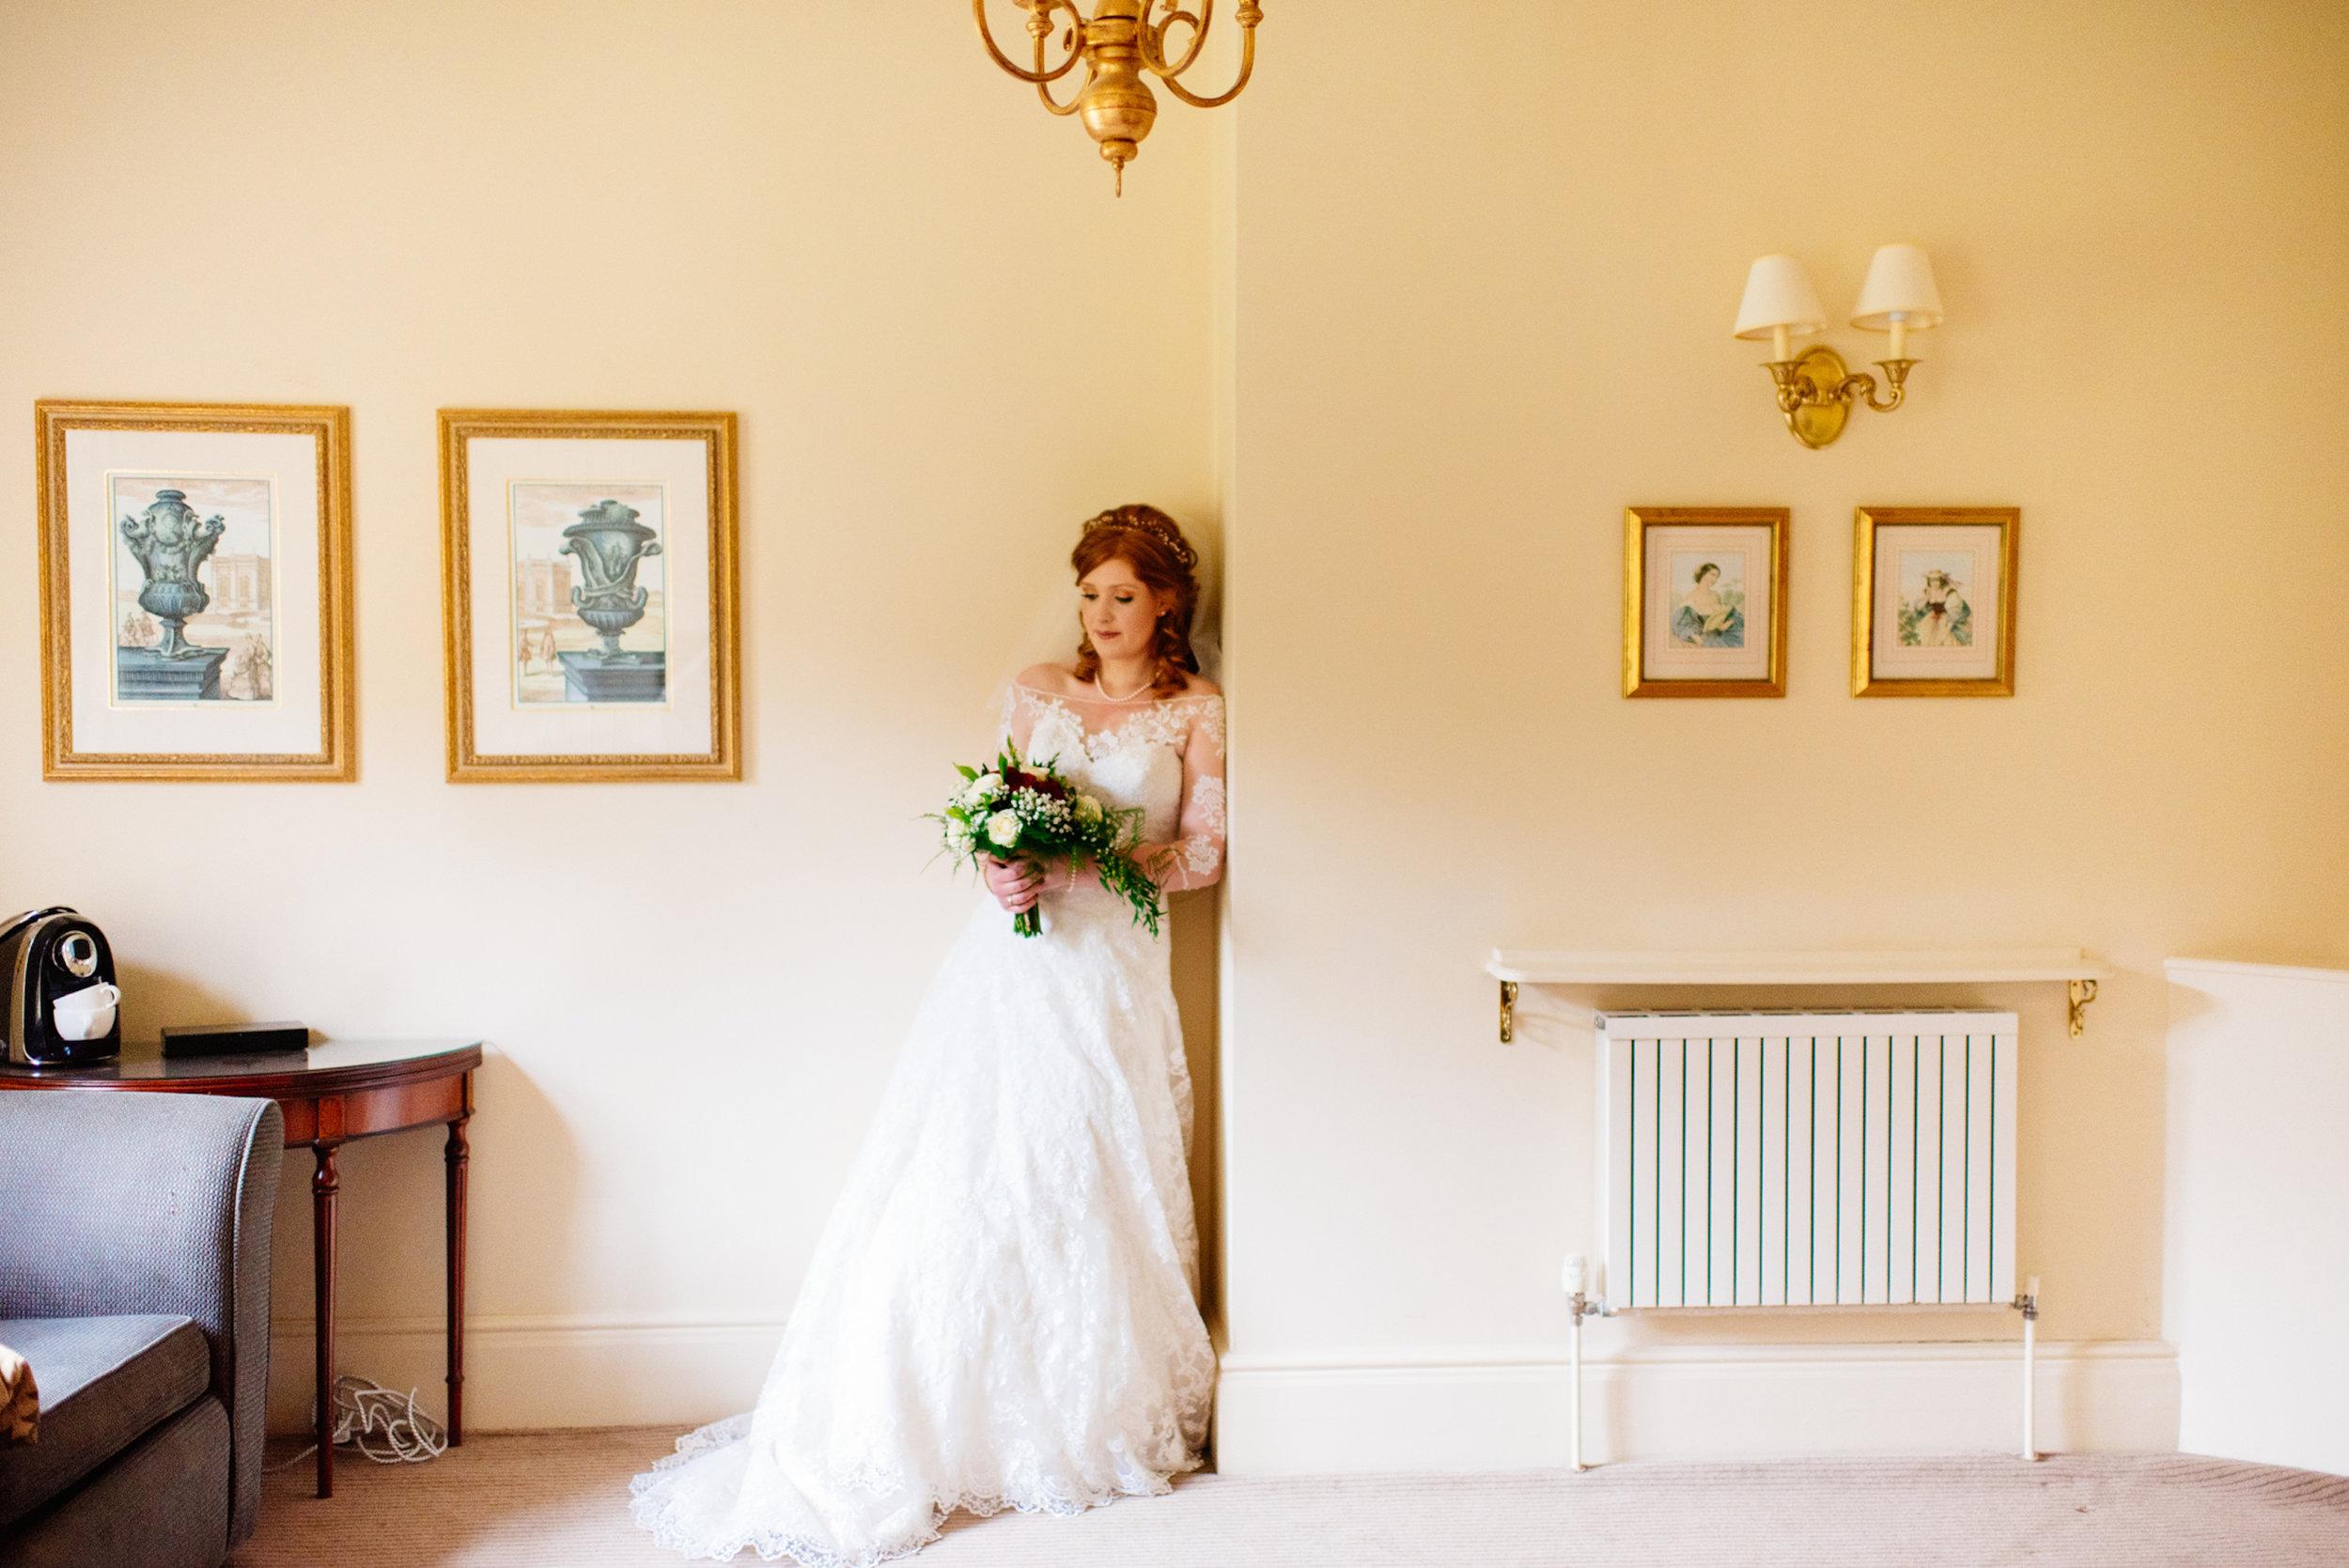 103 Bride Groom London Wedding Photographer Photography.jpg